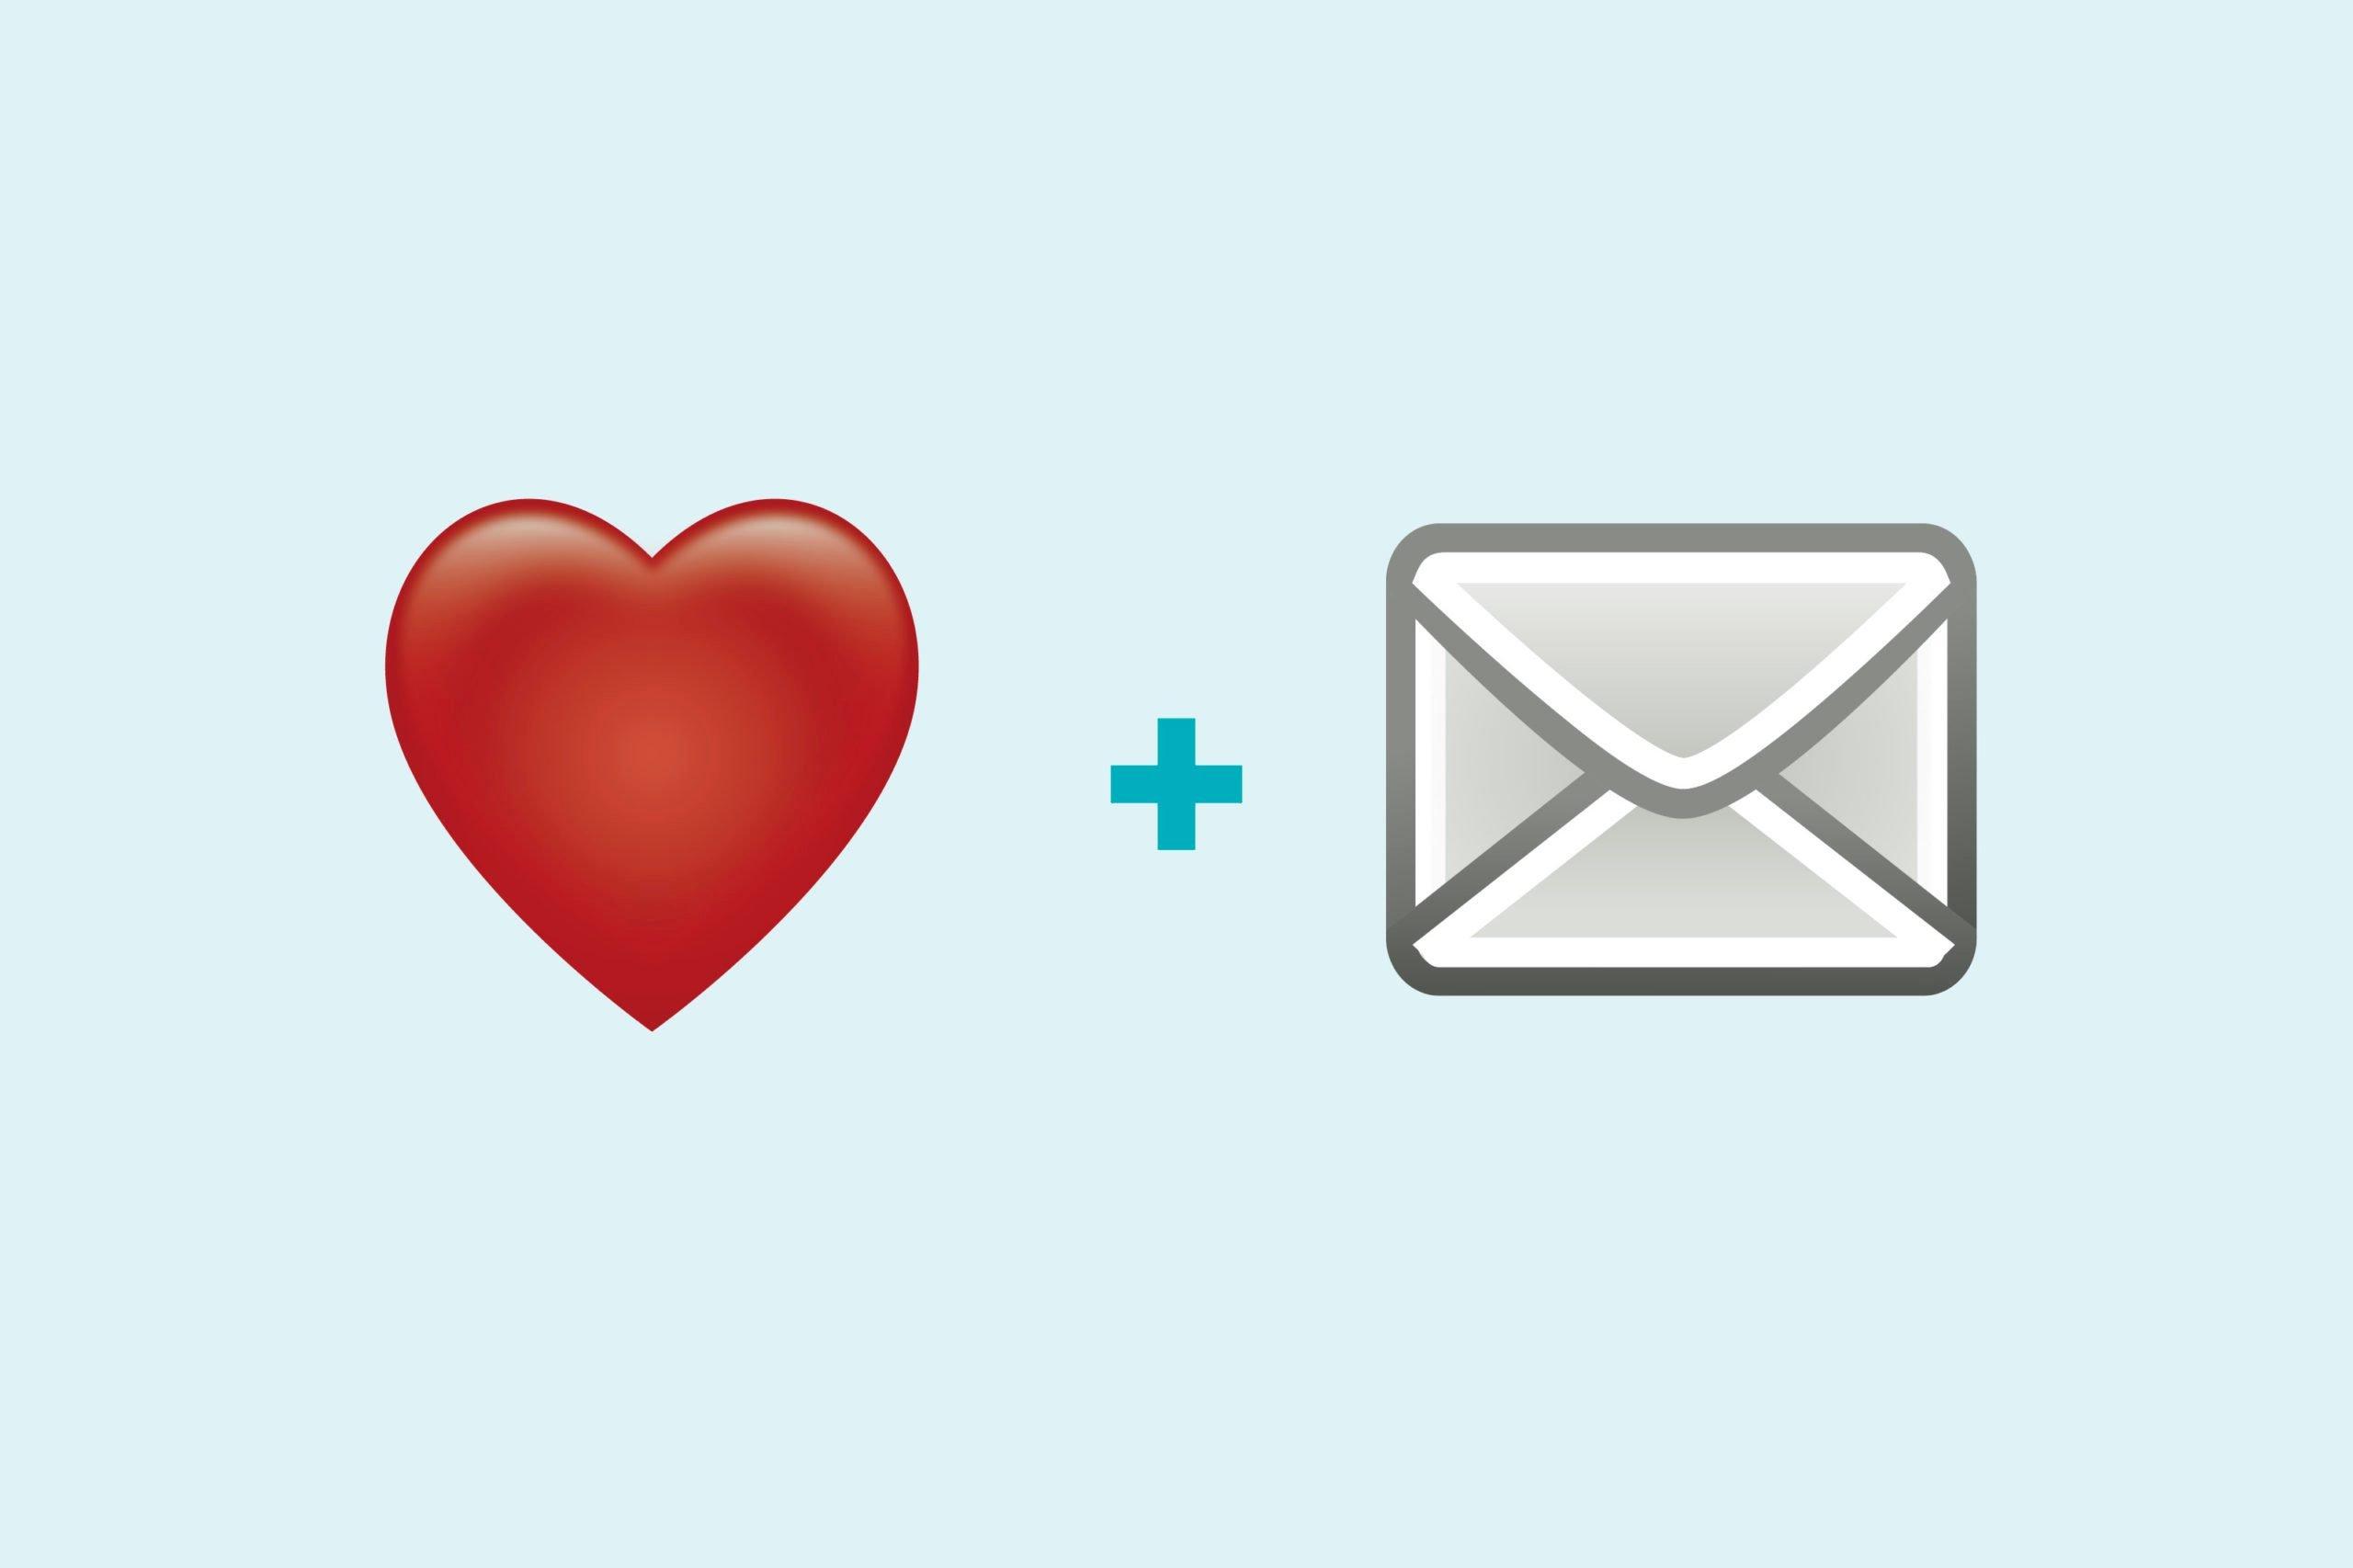 Heart emoji + letter emoji